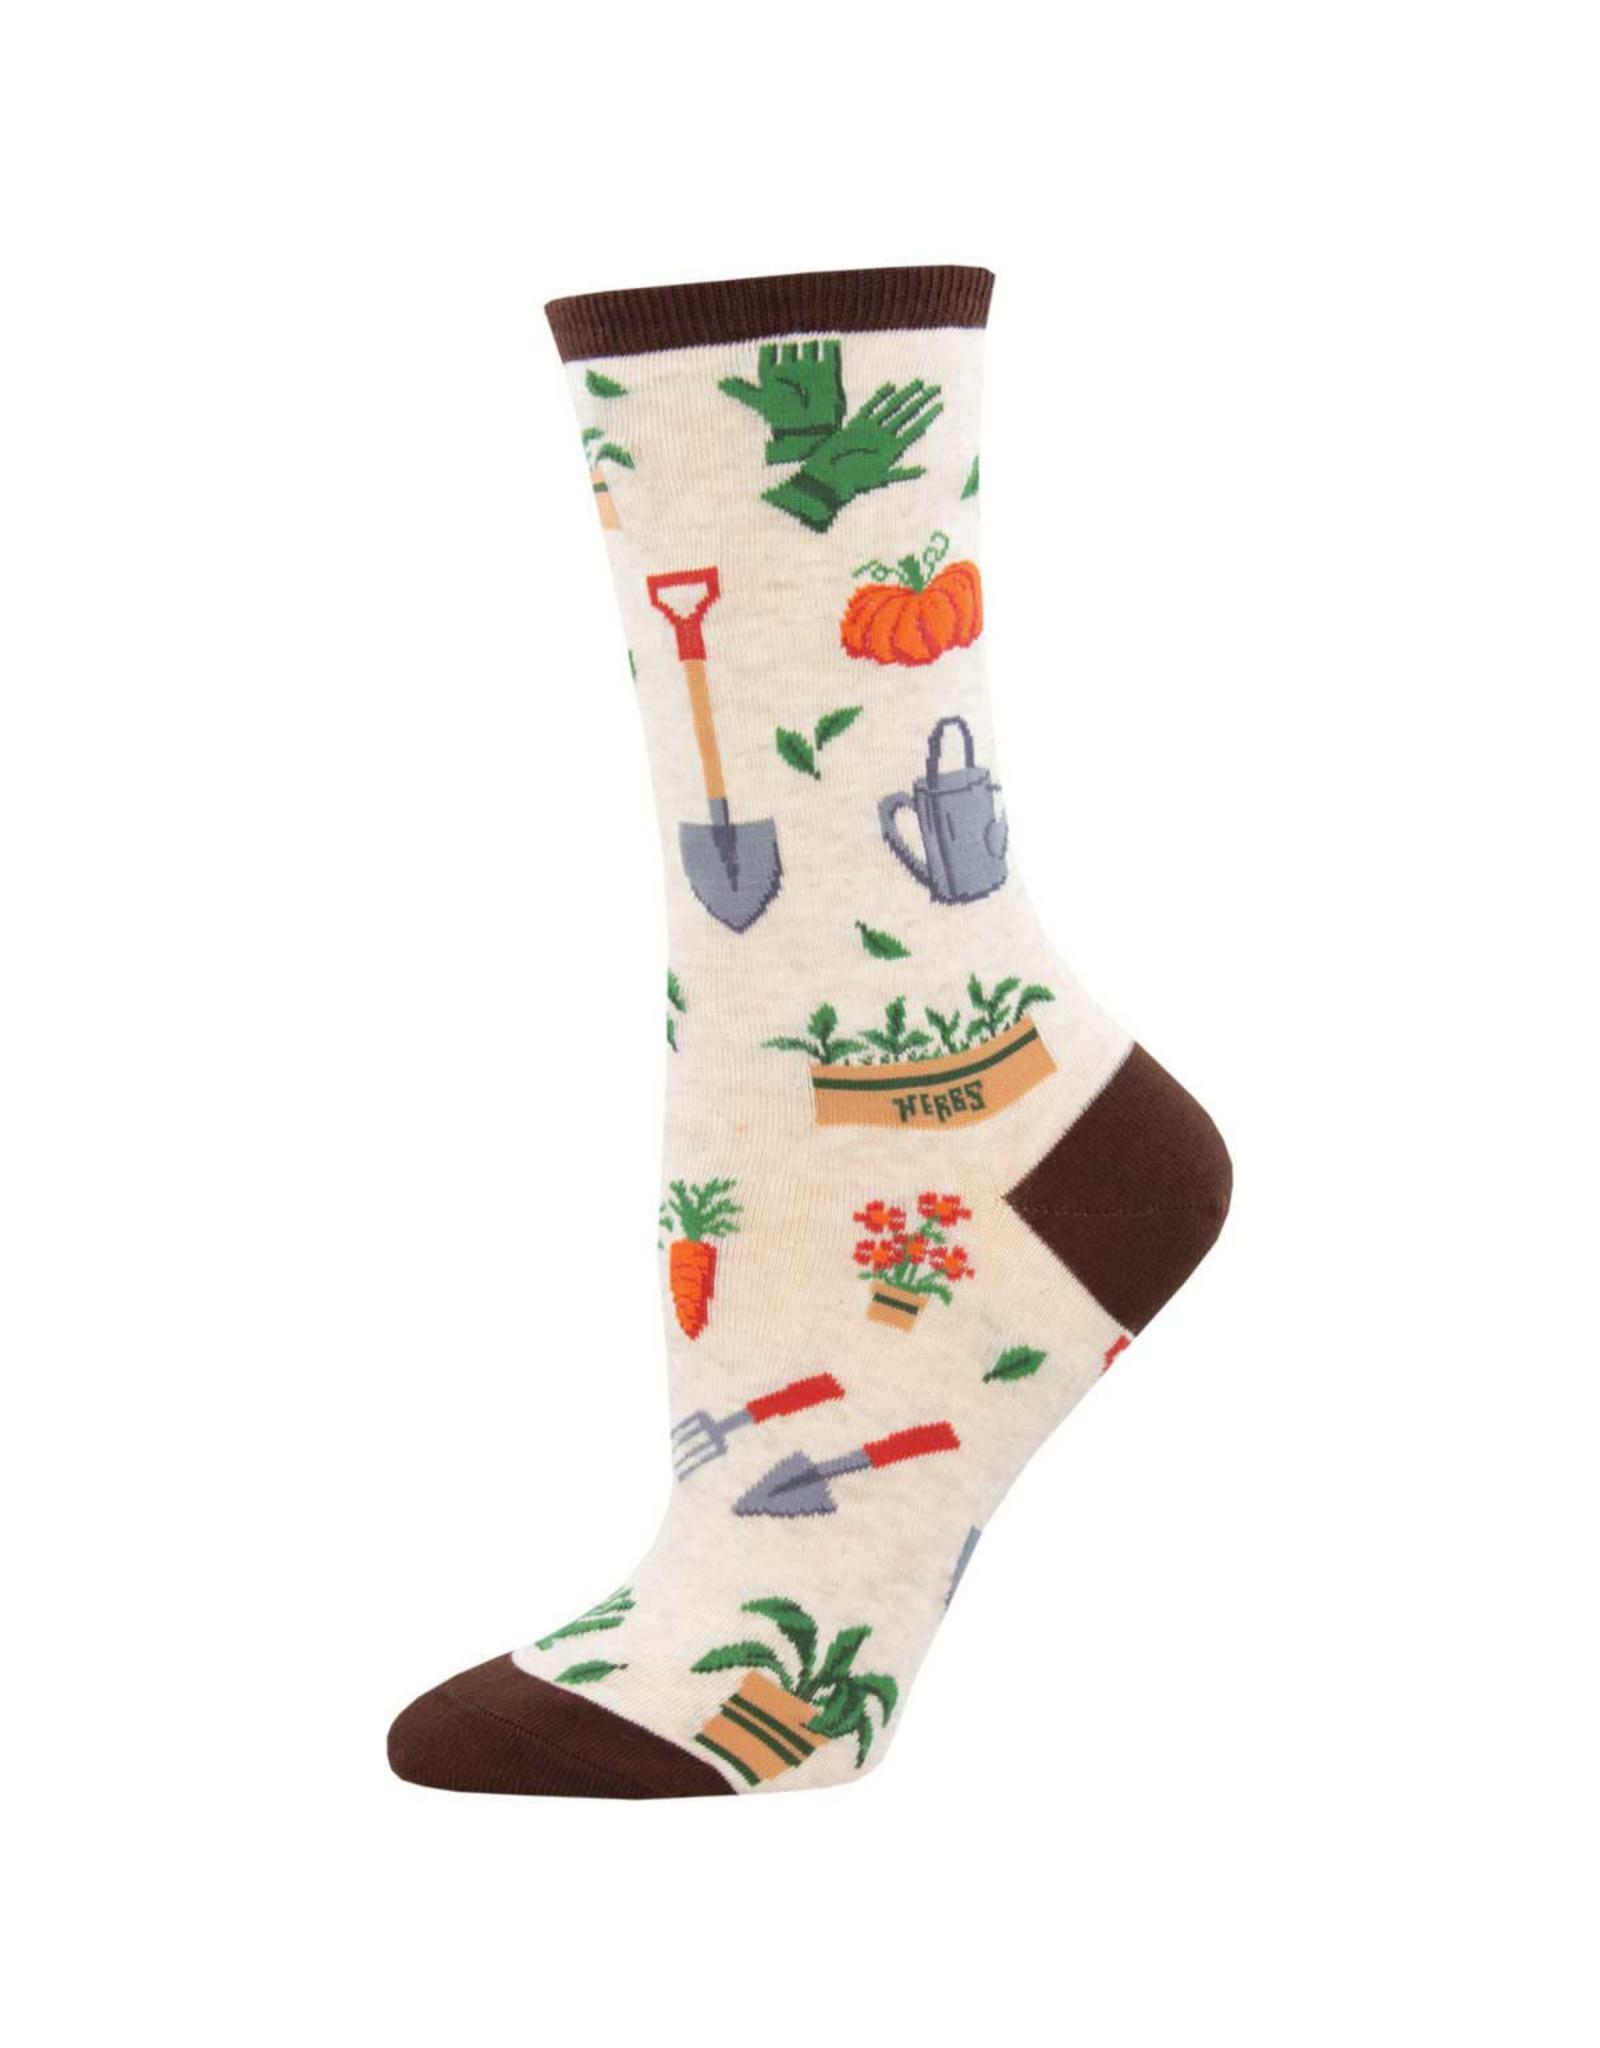 Socksmith Design Hoe Down Ivory Heather 9-11 Women's Crew Socks